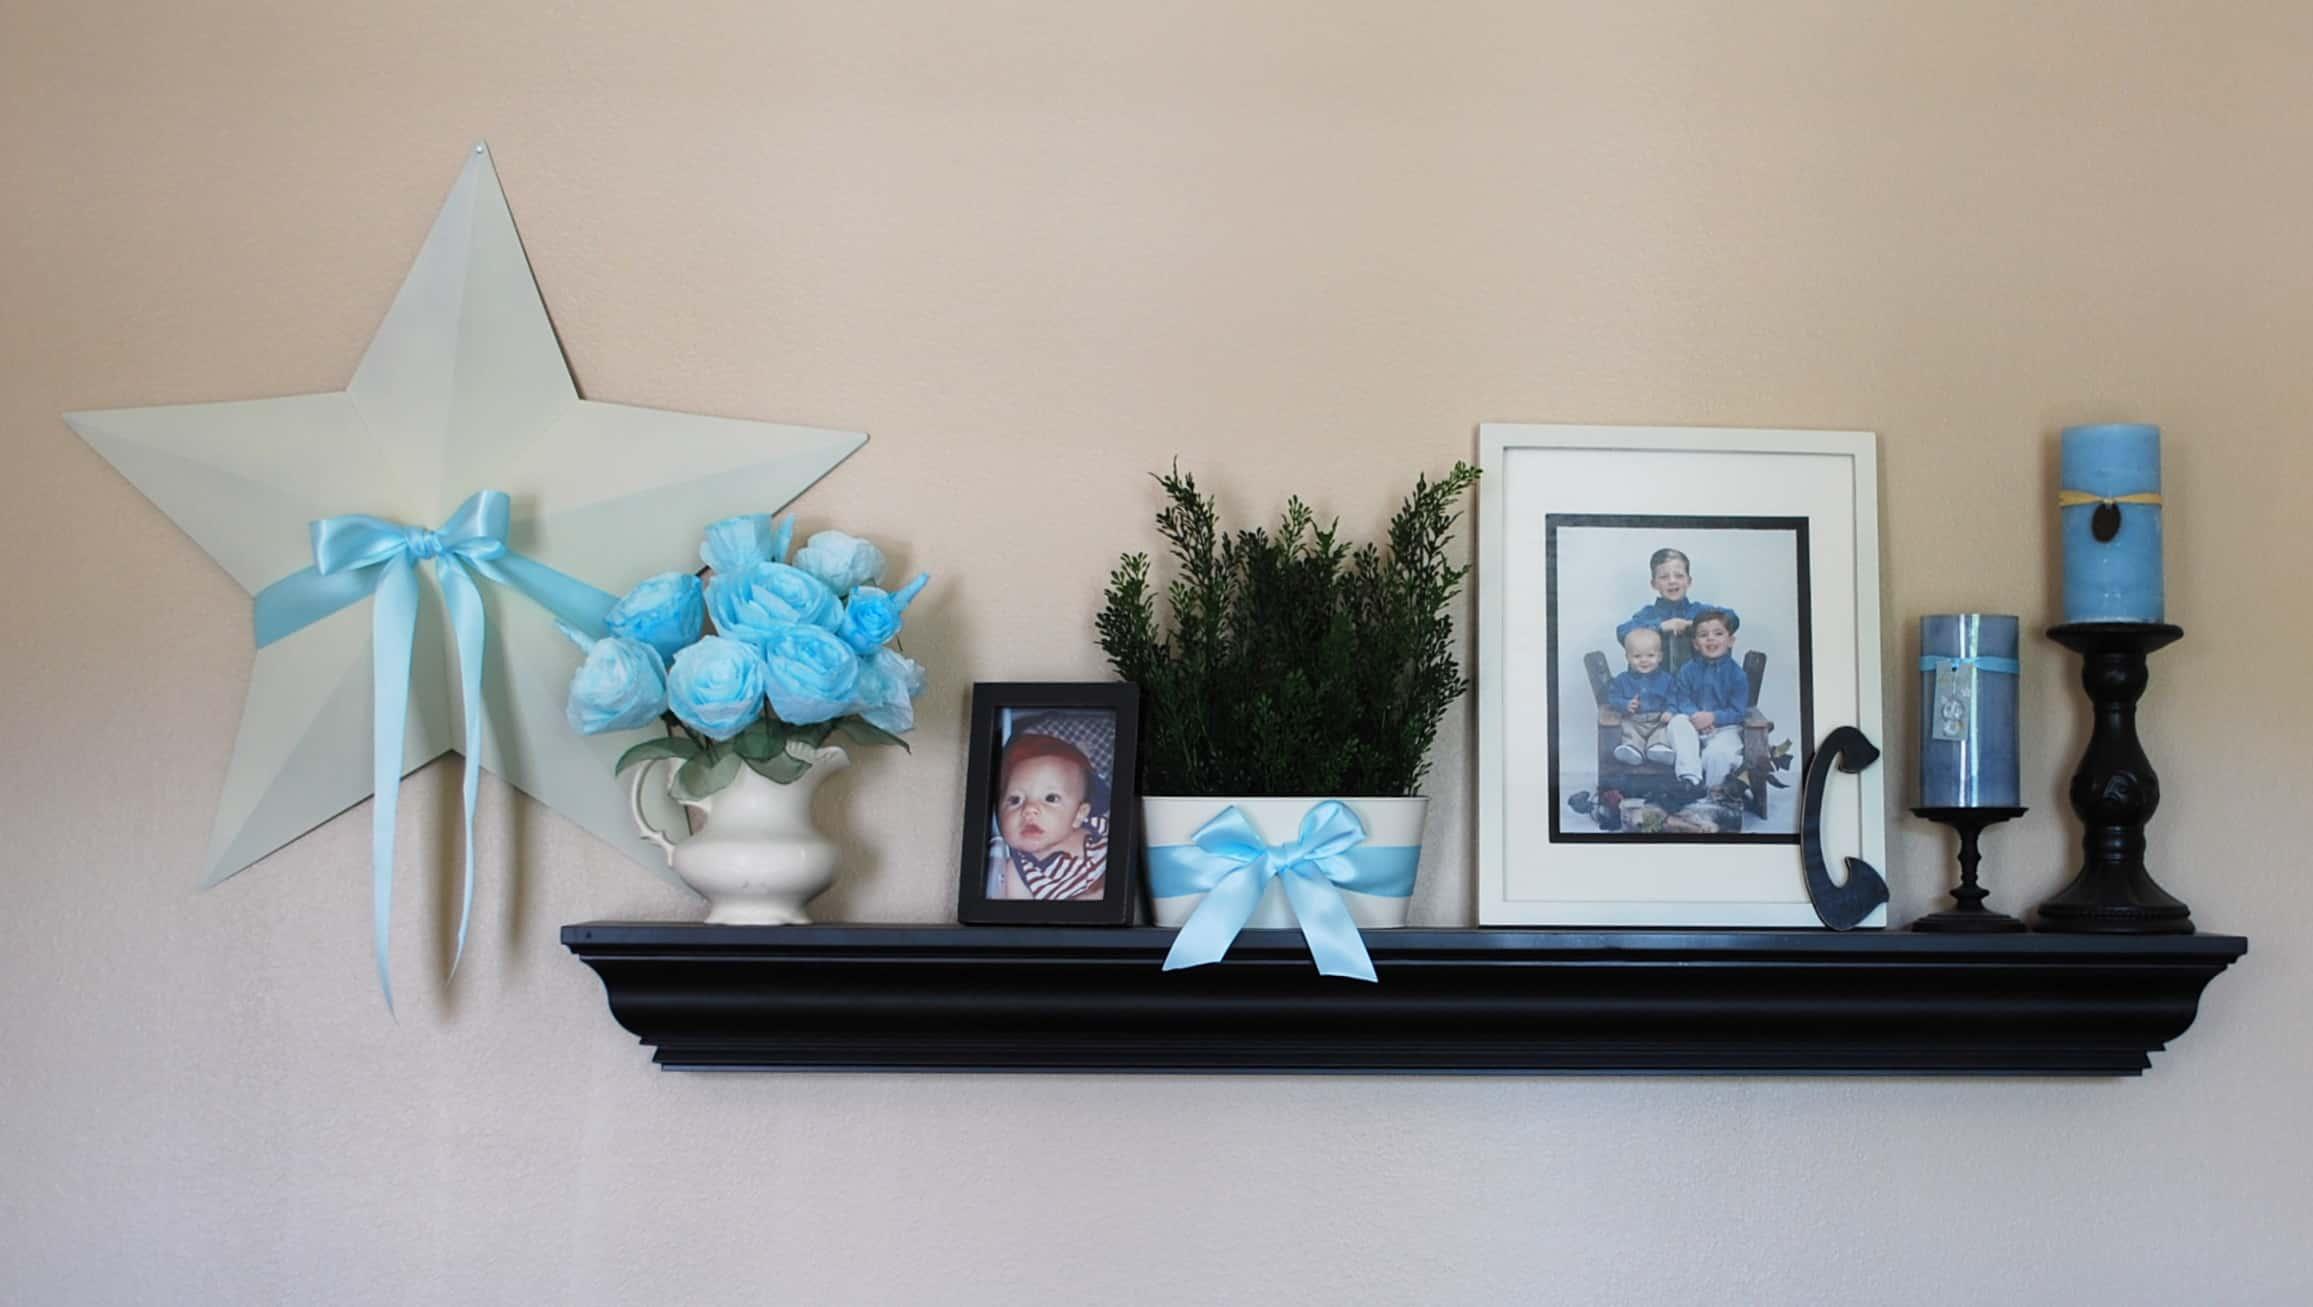 Living Room Shelf 006 Creations By Kara